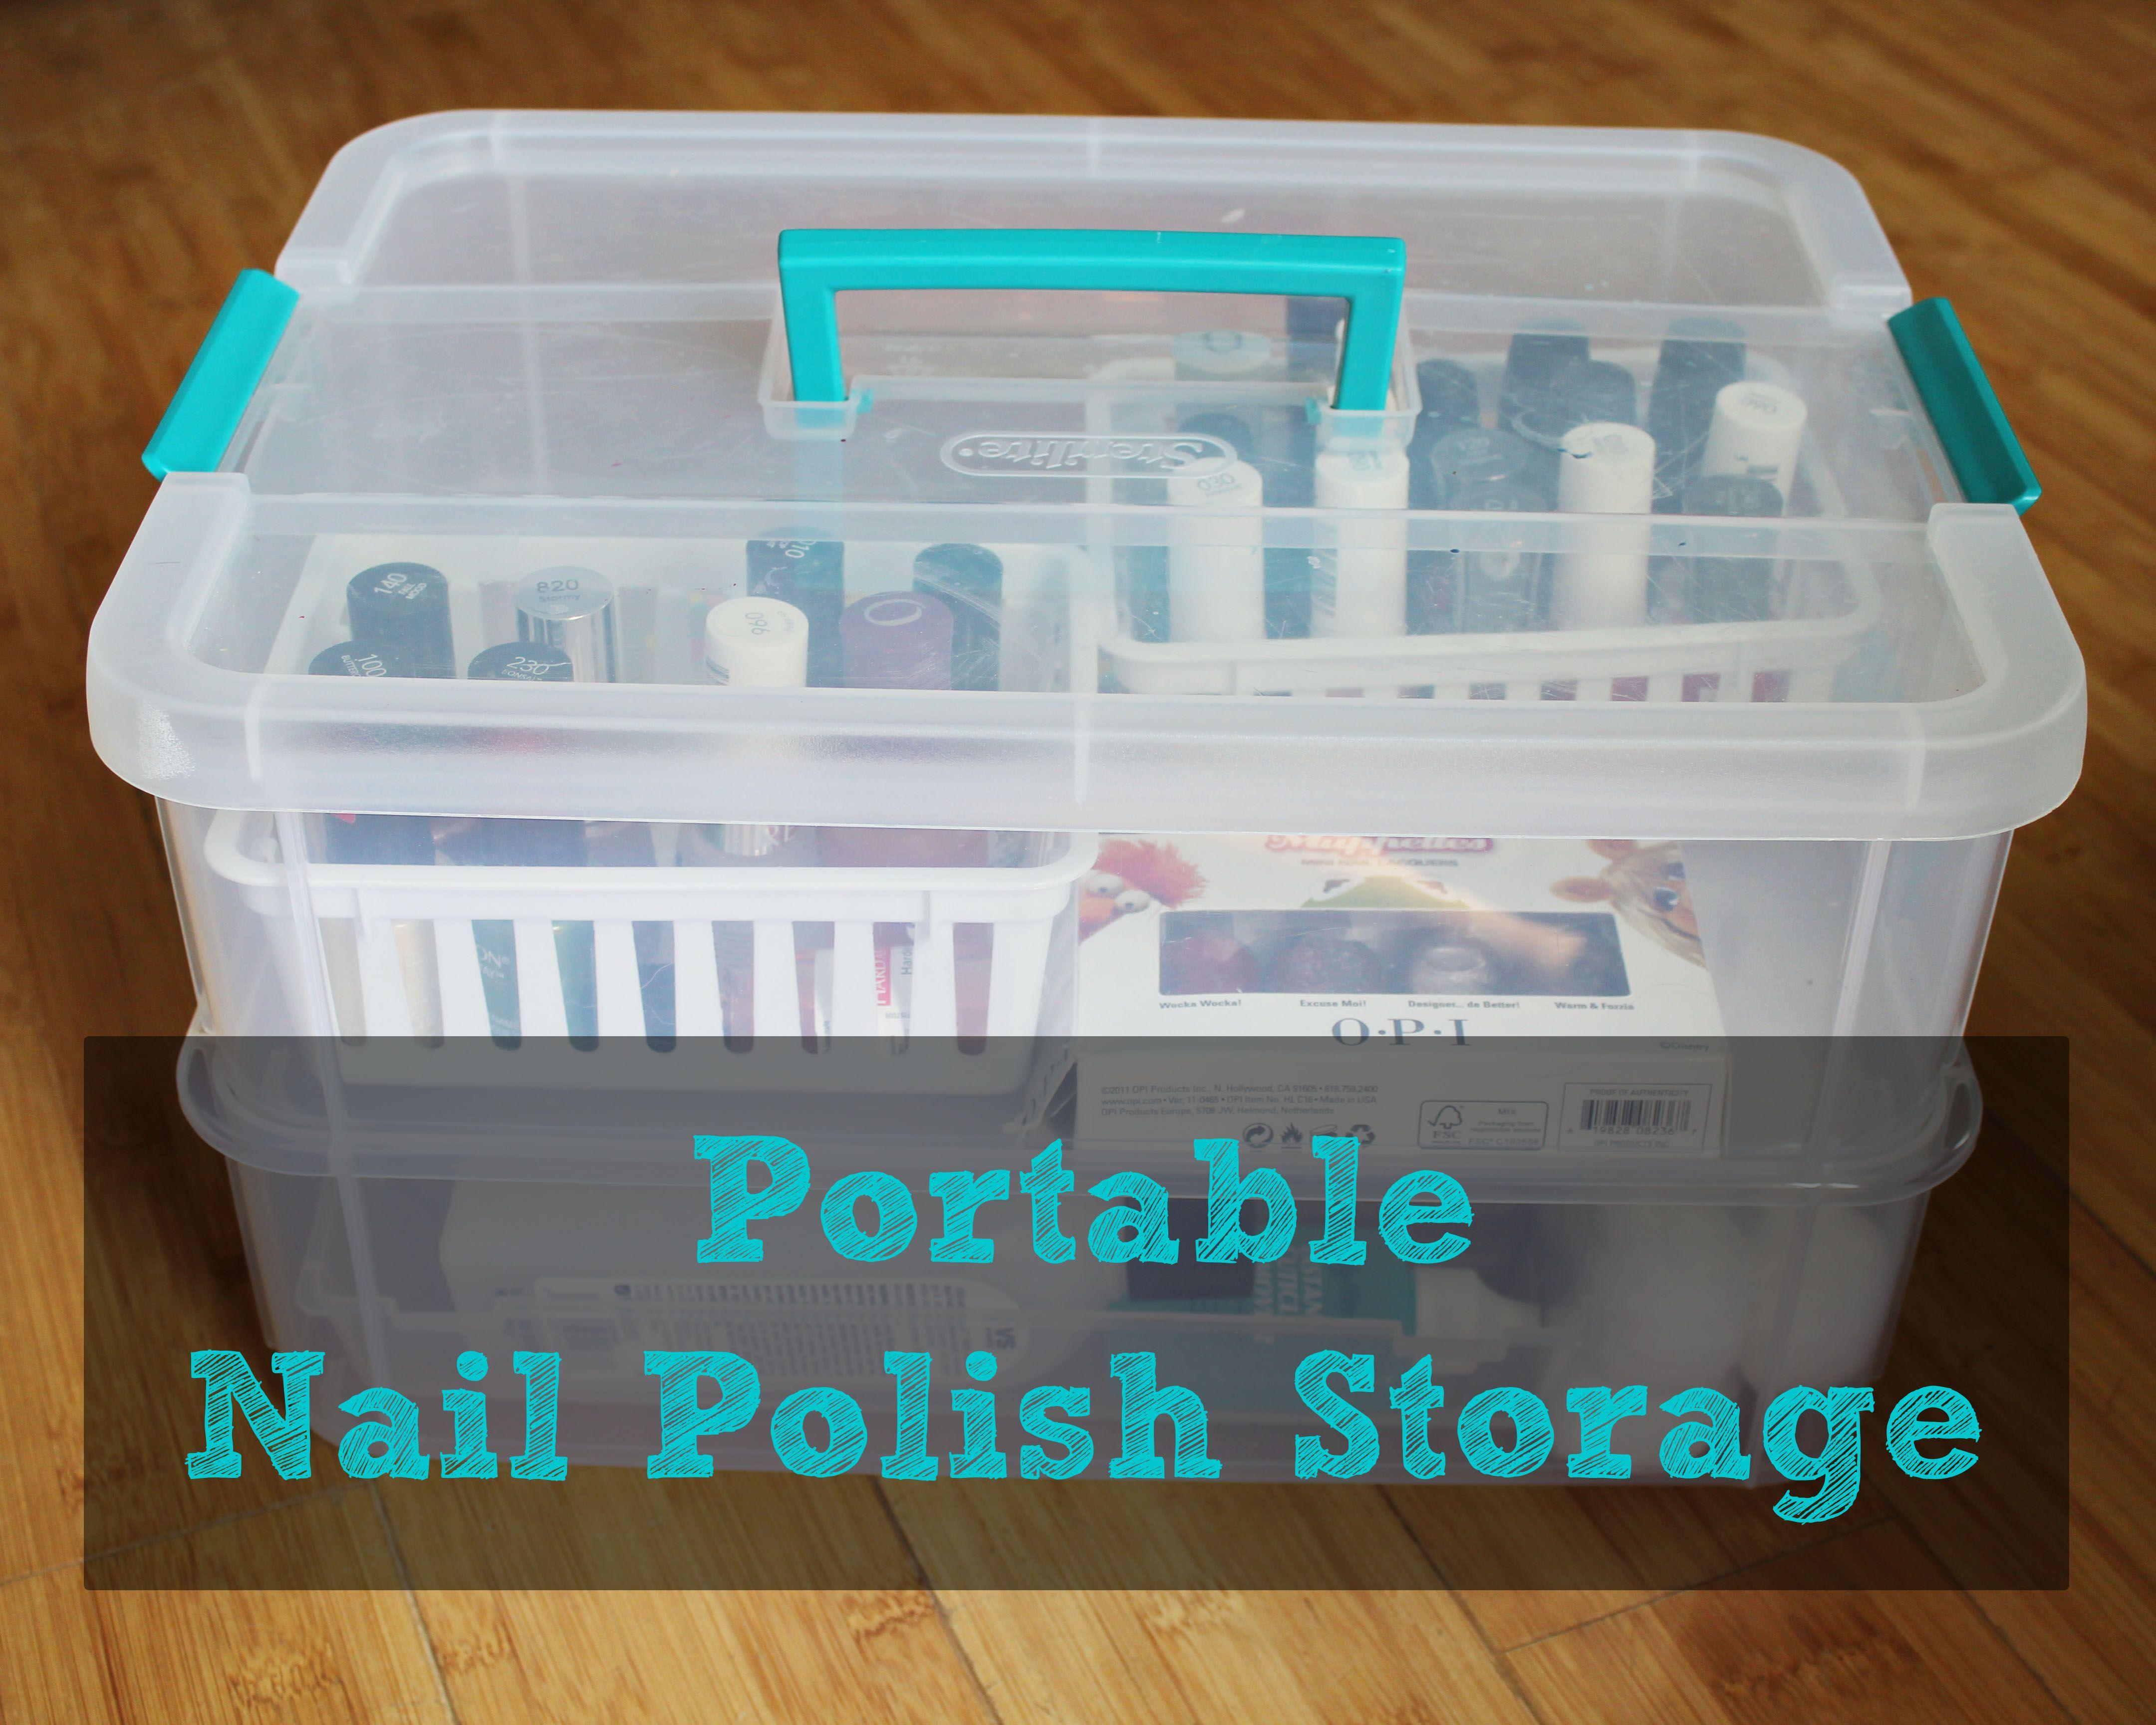 Portable Nail Polish Storage | Organizations, Storage and Organizing